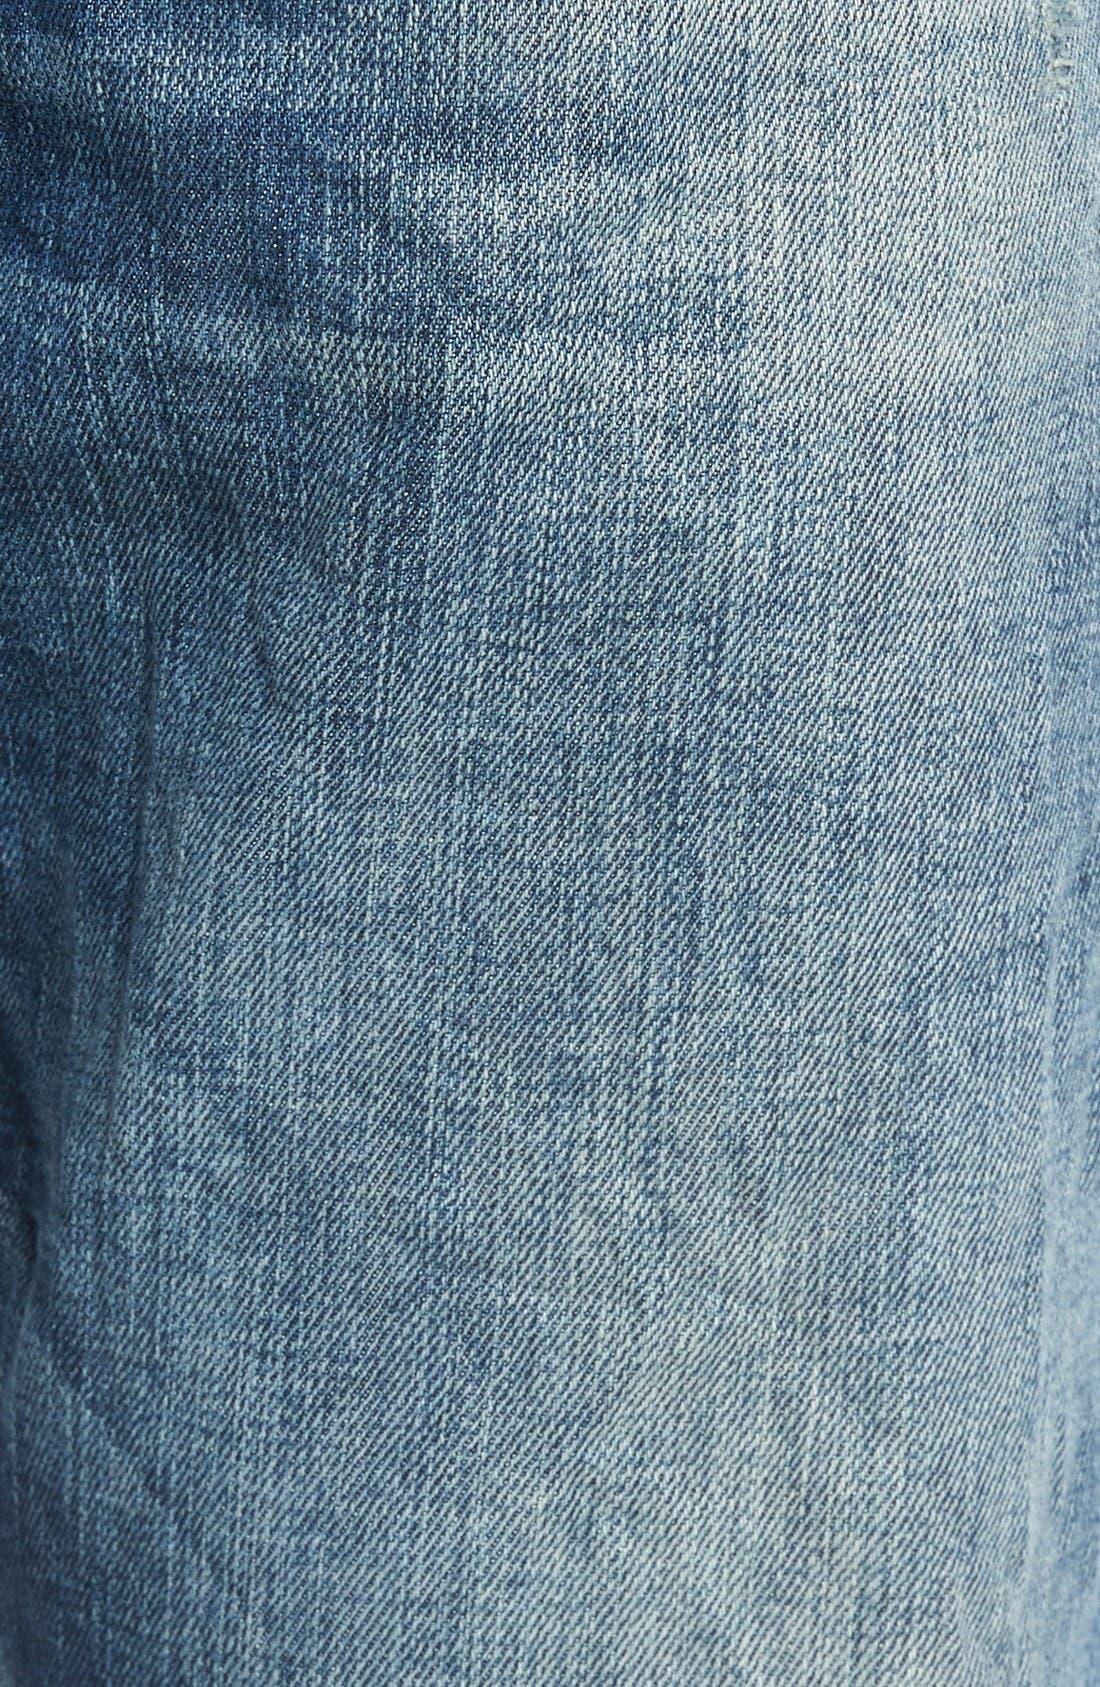 Jake Easy Slim Fit Jeans,                             Alternate thumbnail 5, color,                             Random Extreme Vintage